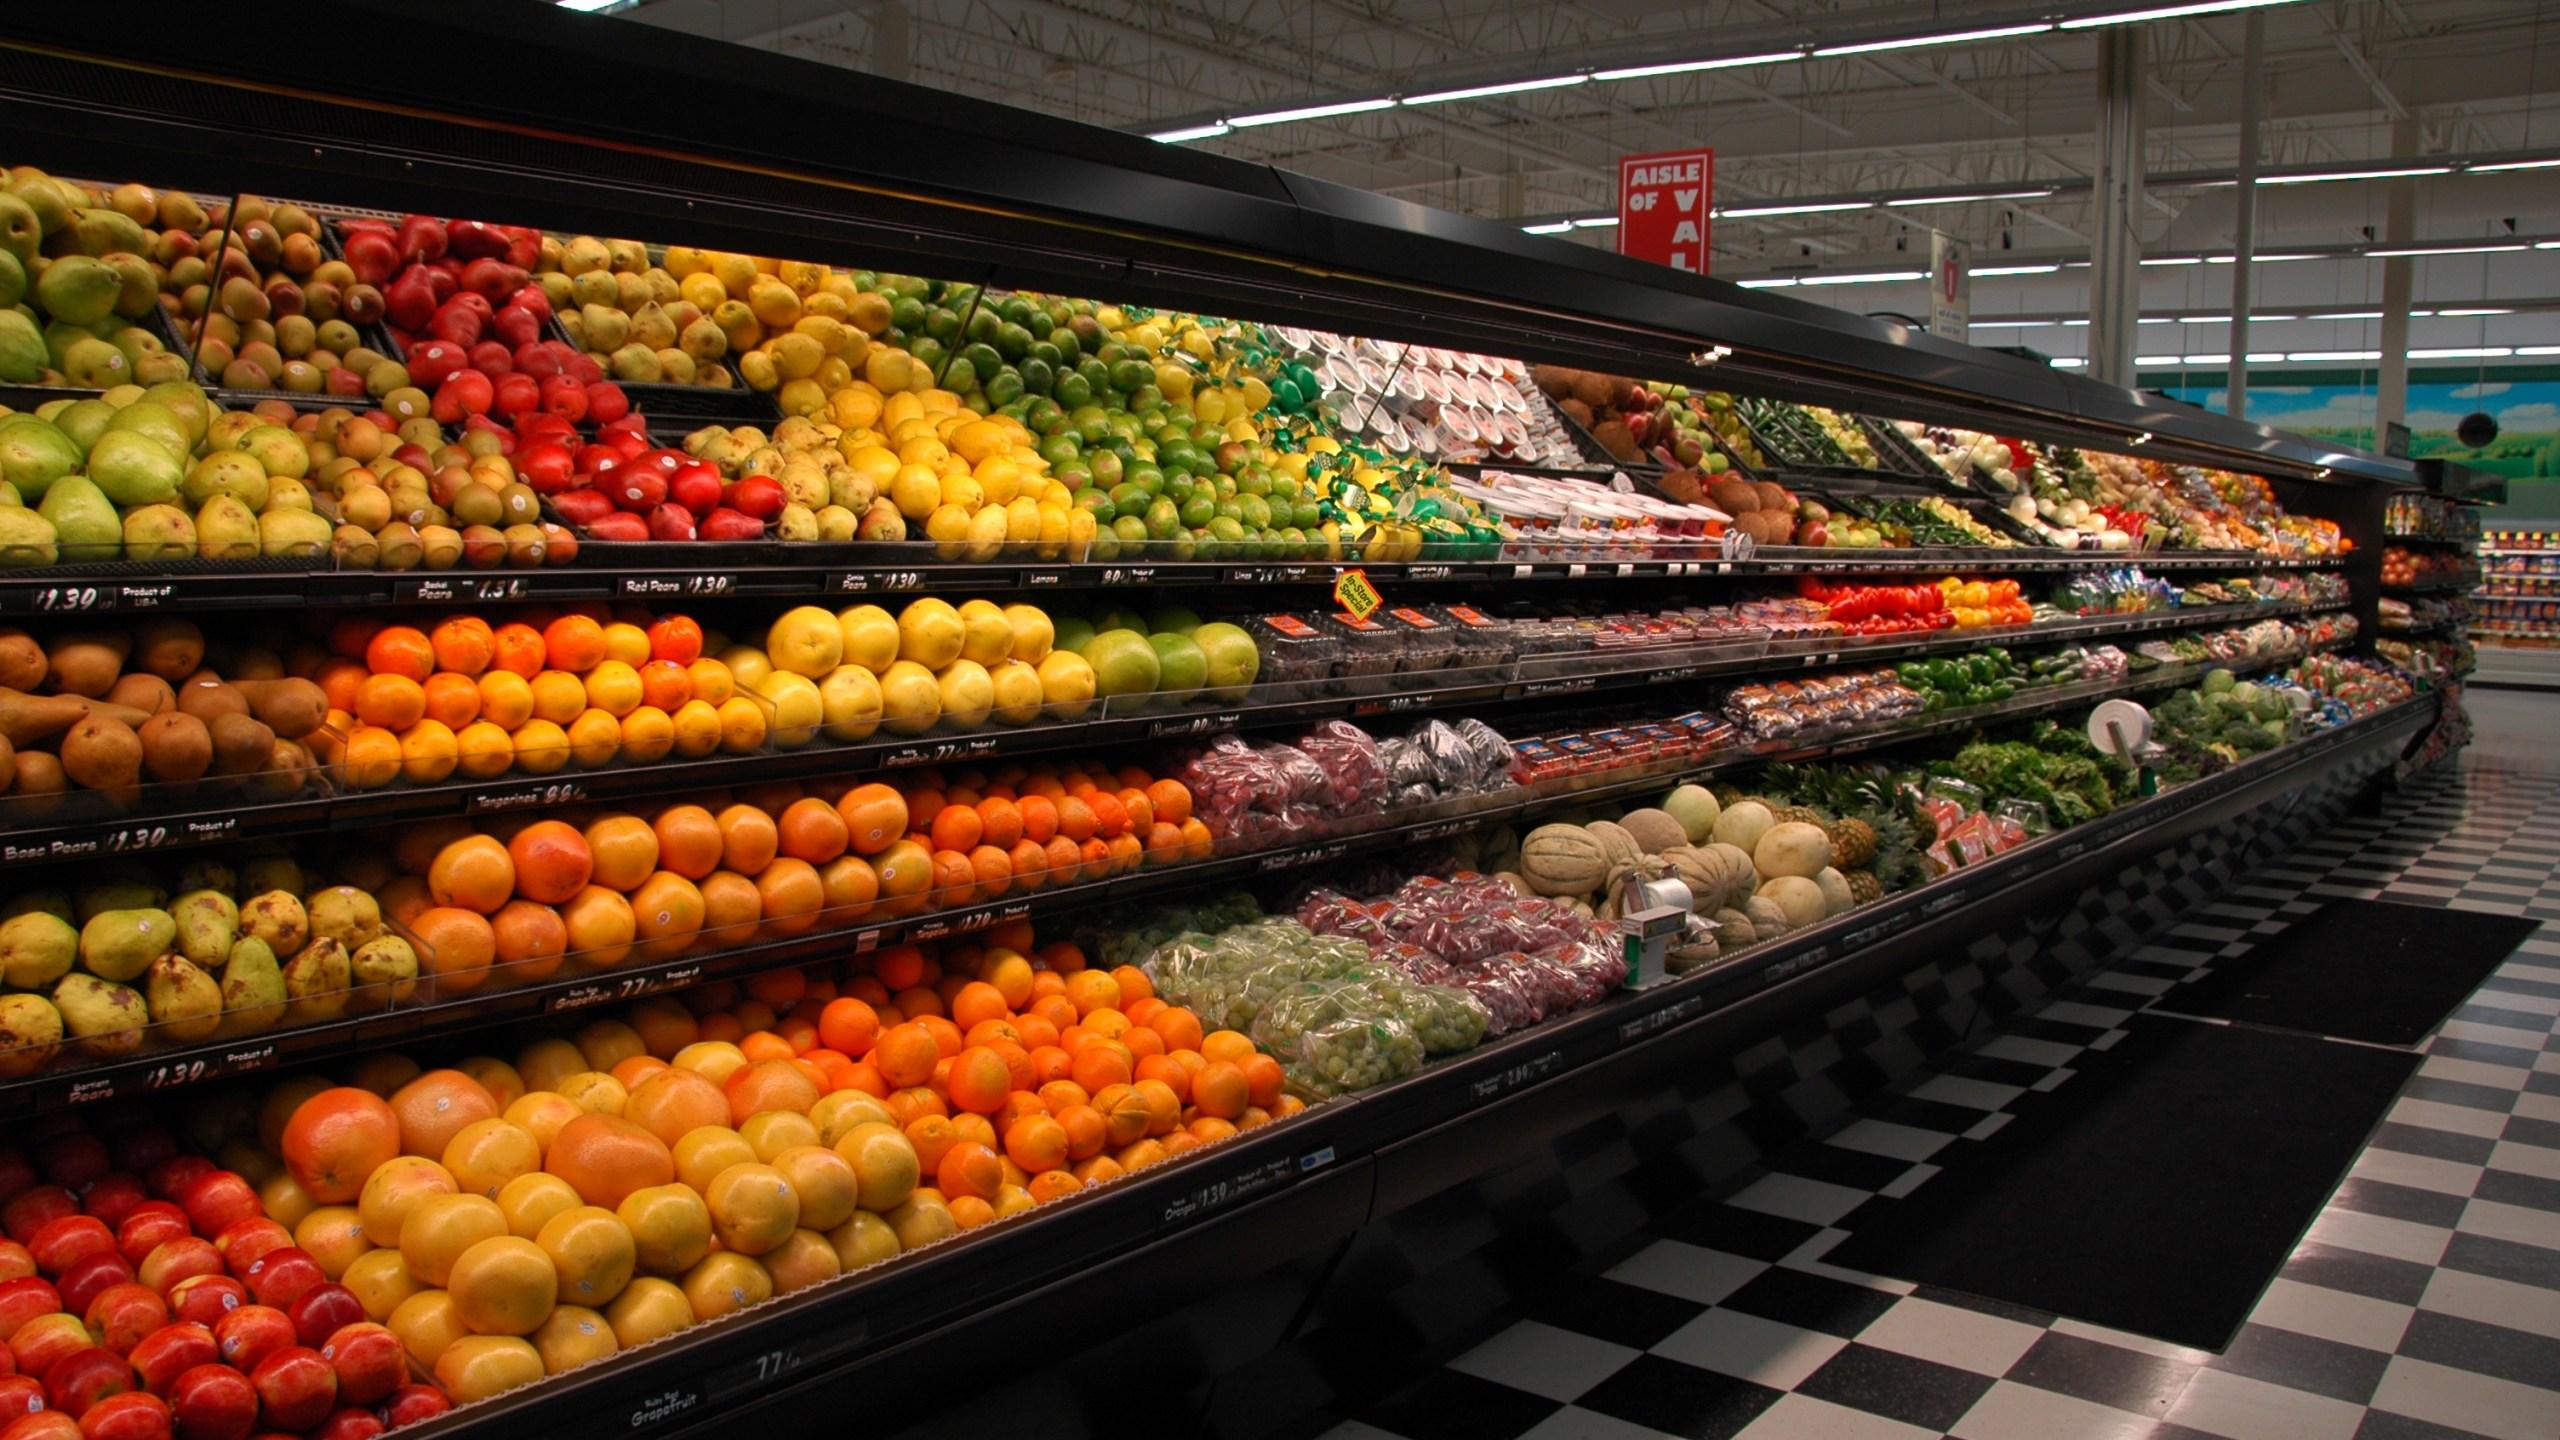 fruit produce_1537292534309.jpg.jpg